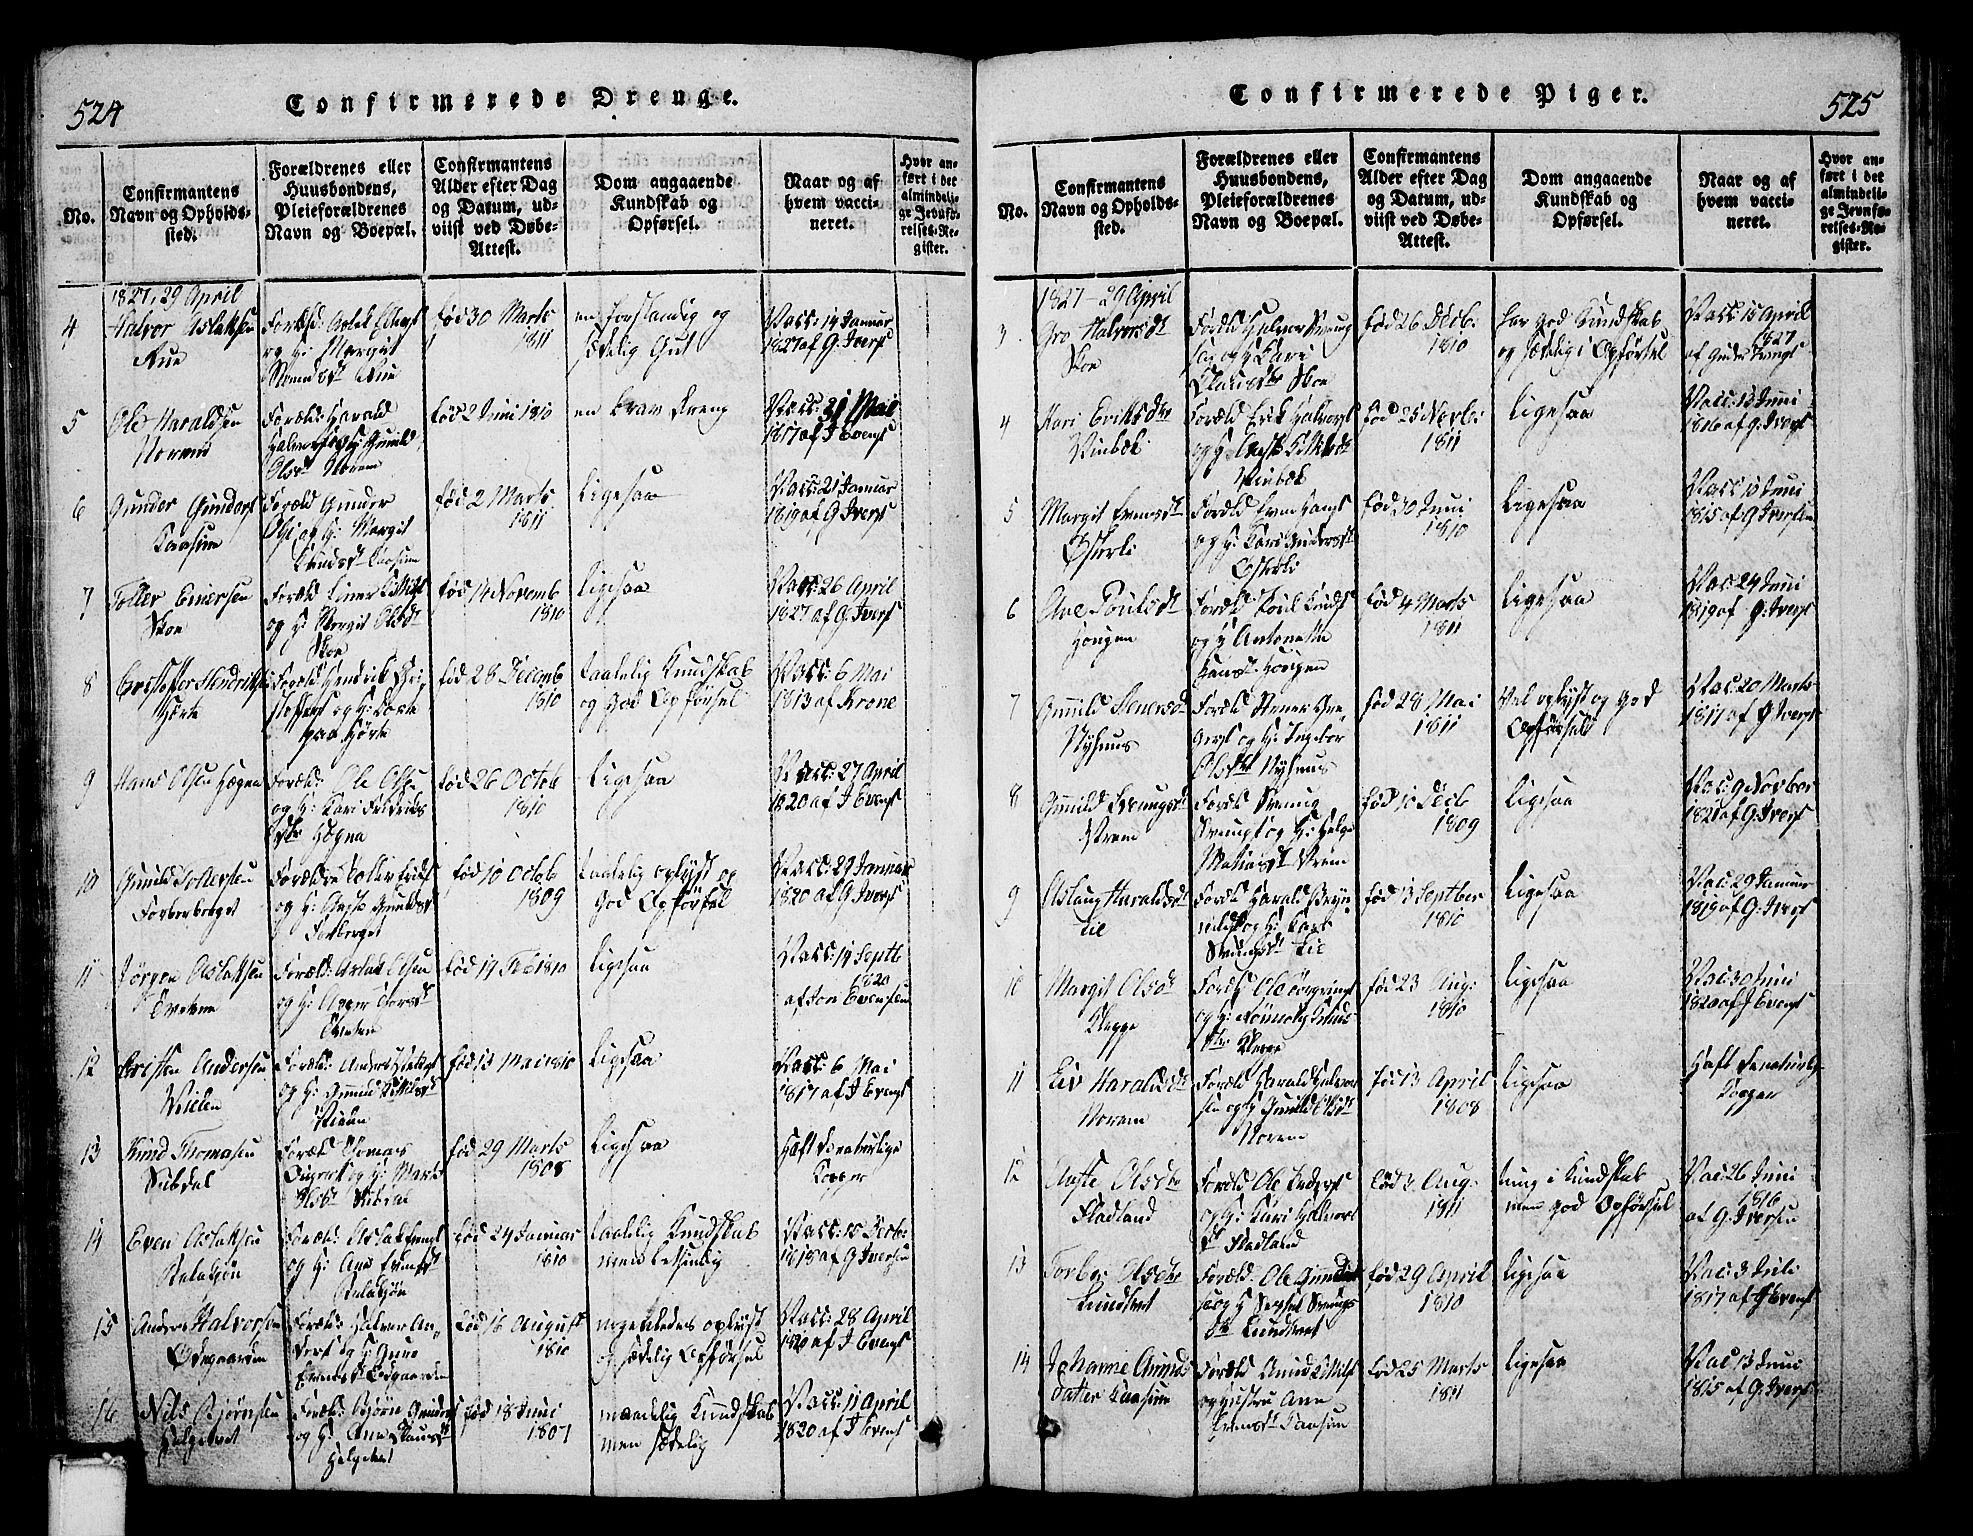 SAKO, Bø kirkebøker, G/Ga/L0001: Klokkerbok nr. 1, 1815-1831, s. 524-525